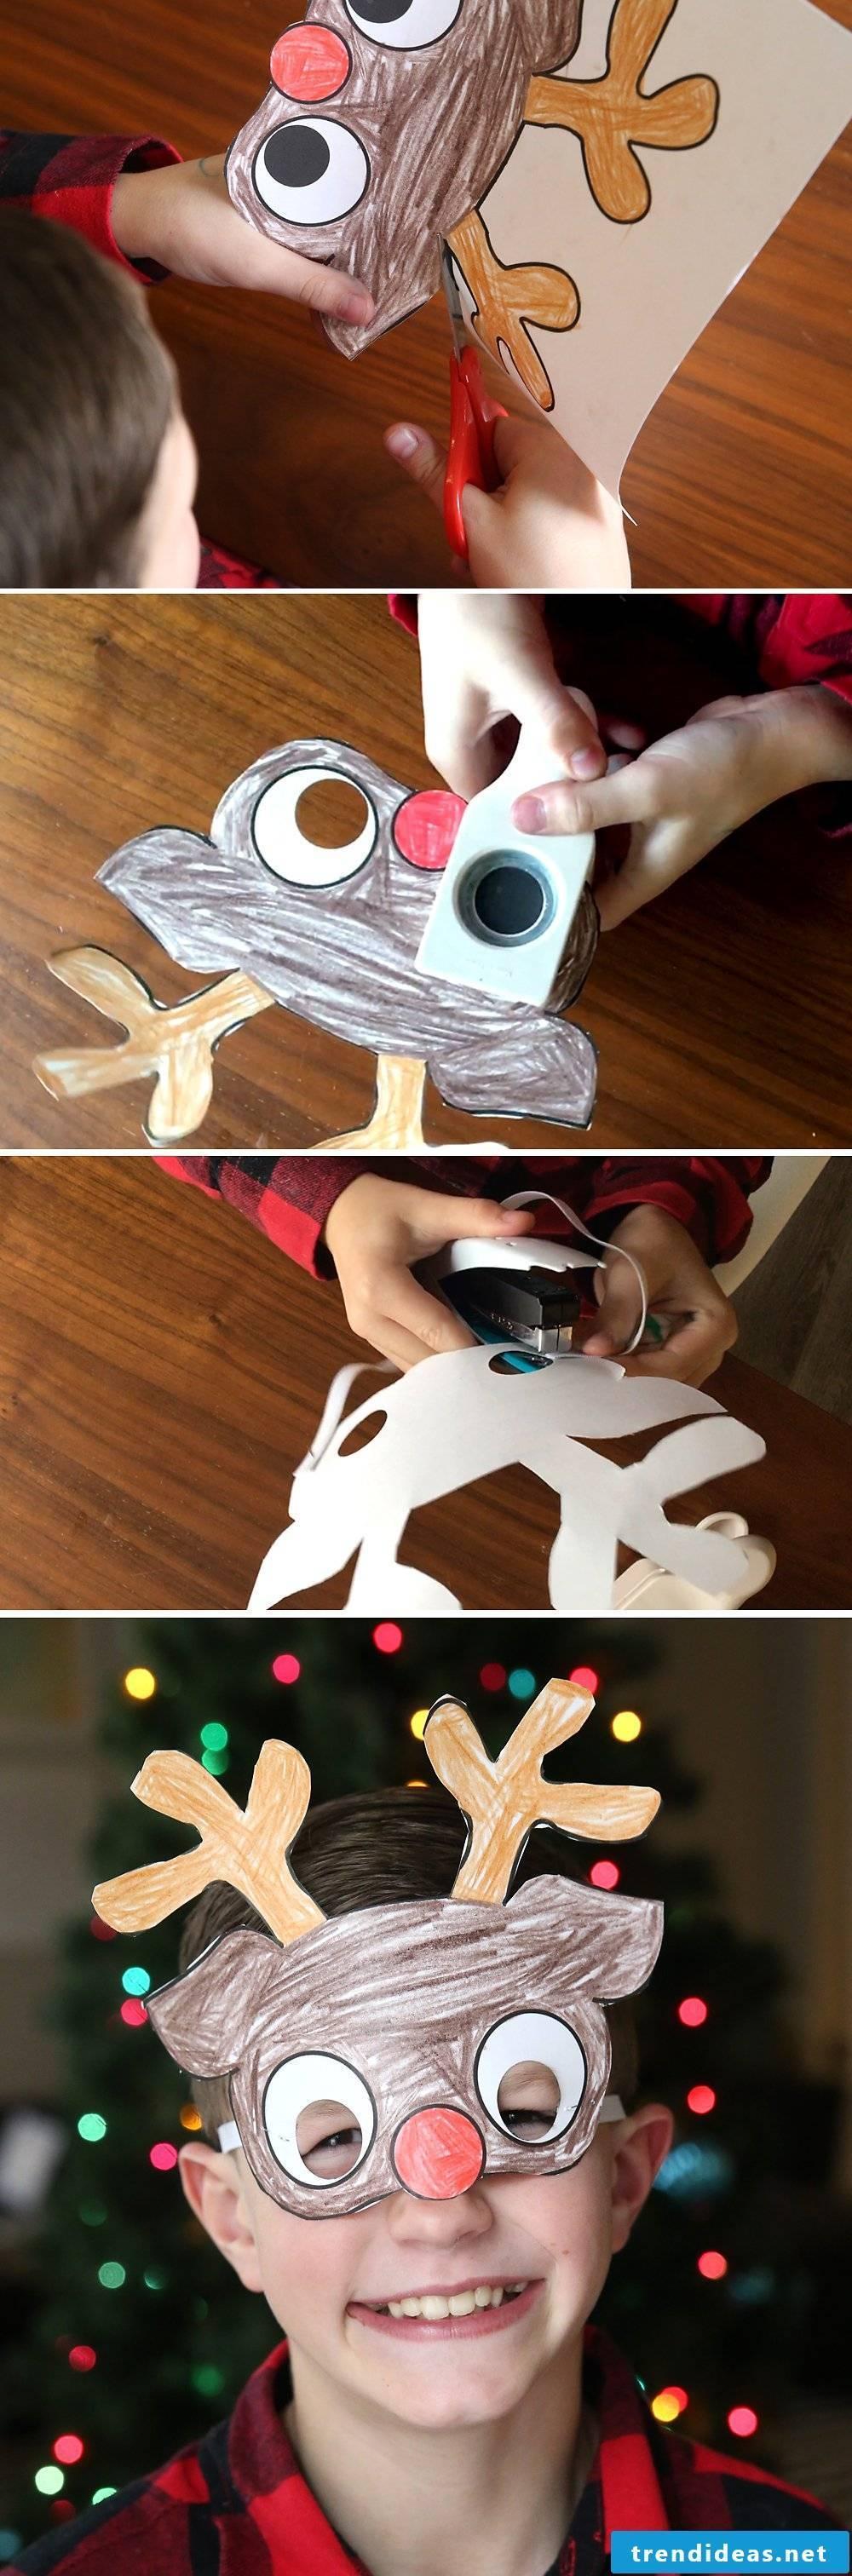 Craft Ideas Christmas - make masks